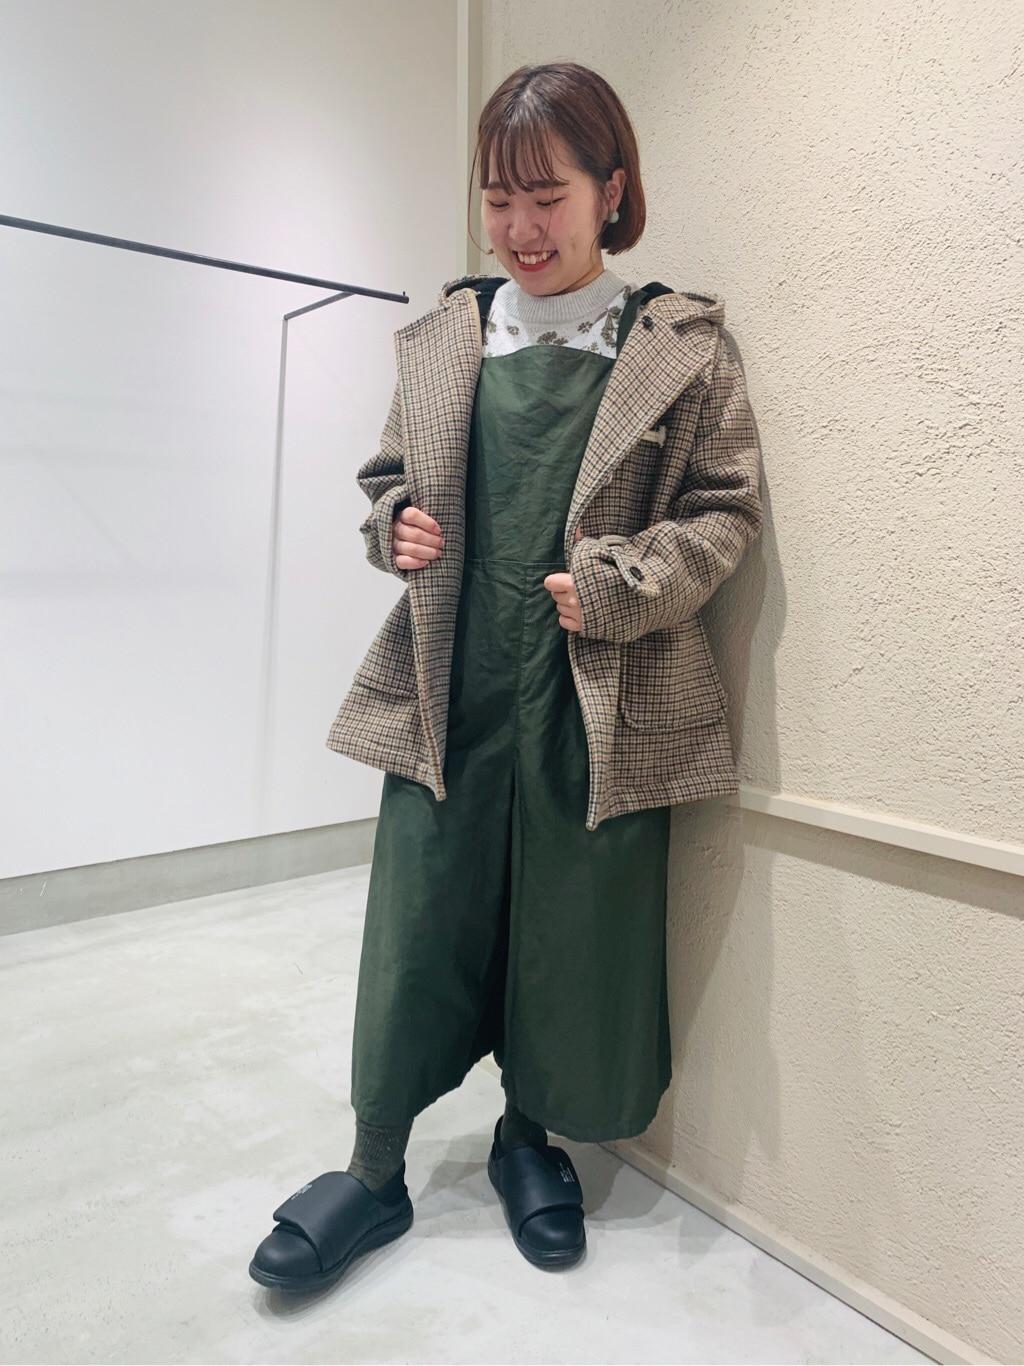 chambre de charme 横浜ジョイナス 身長:155cm 2020.10.18